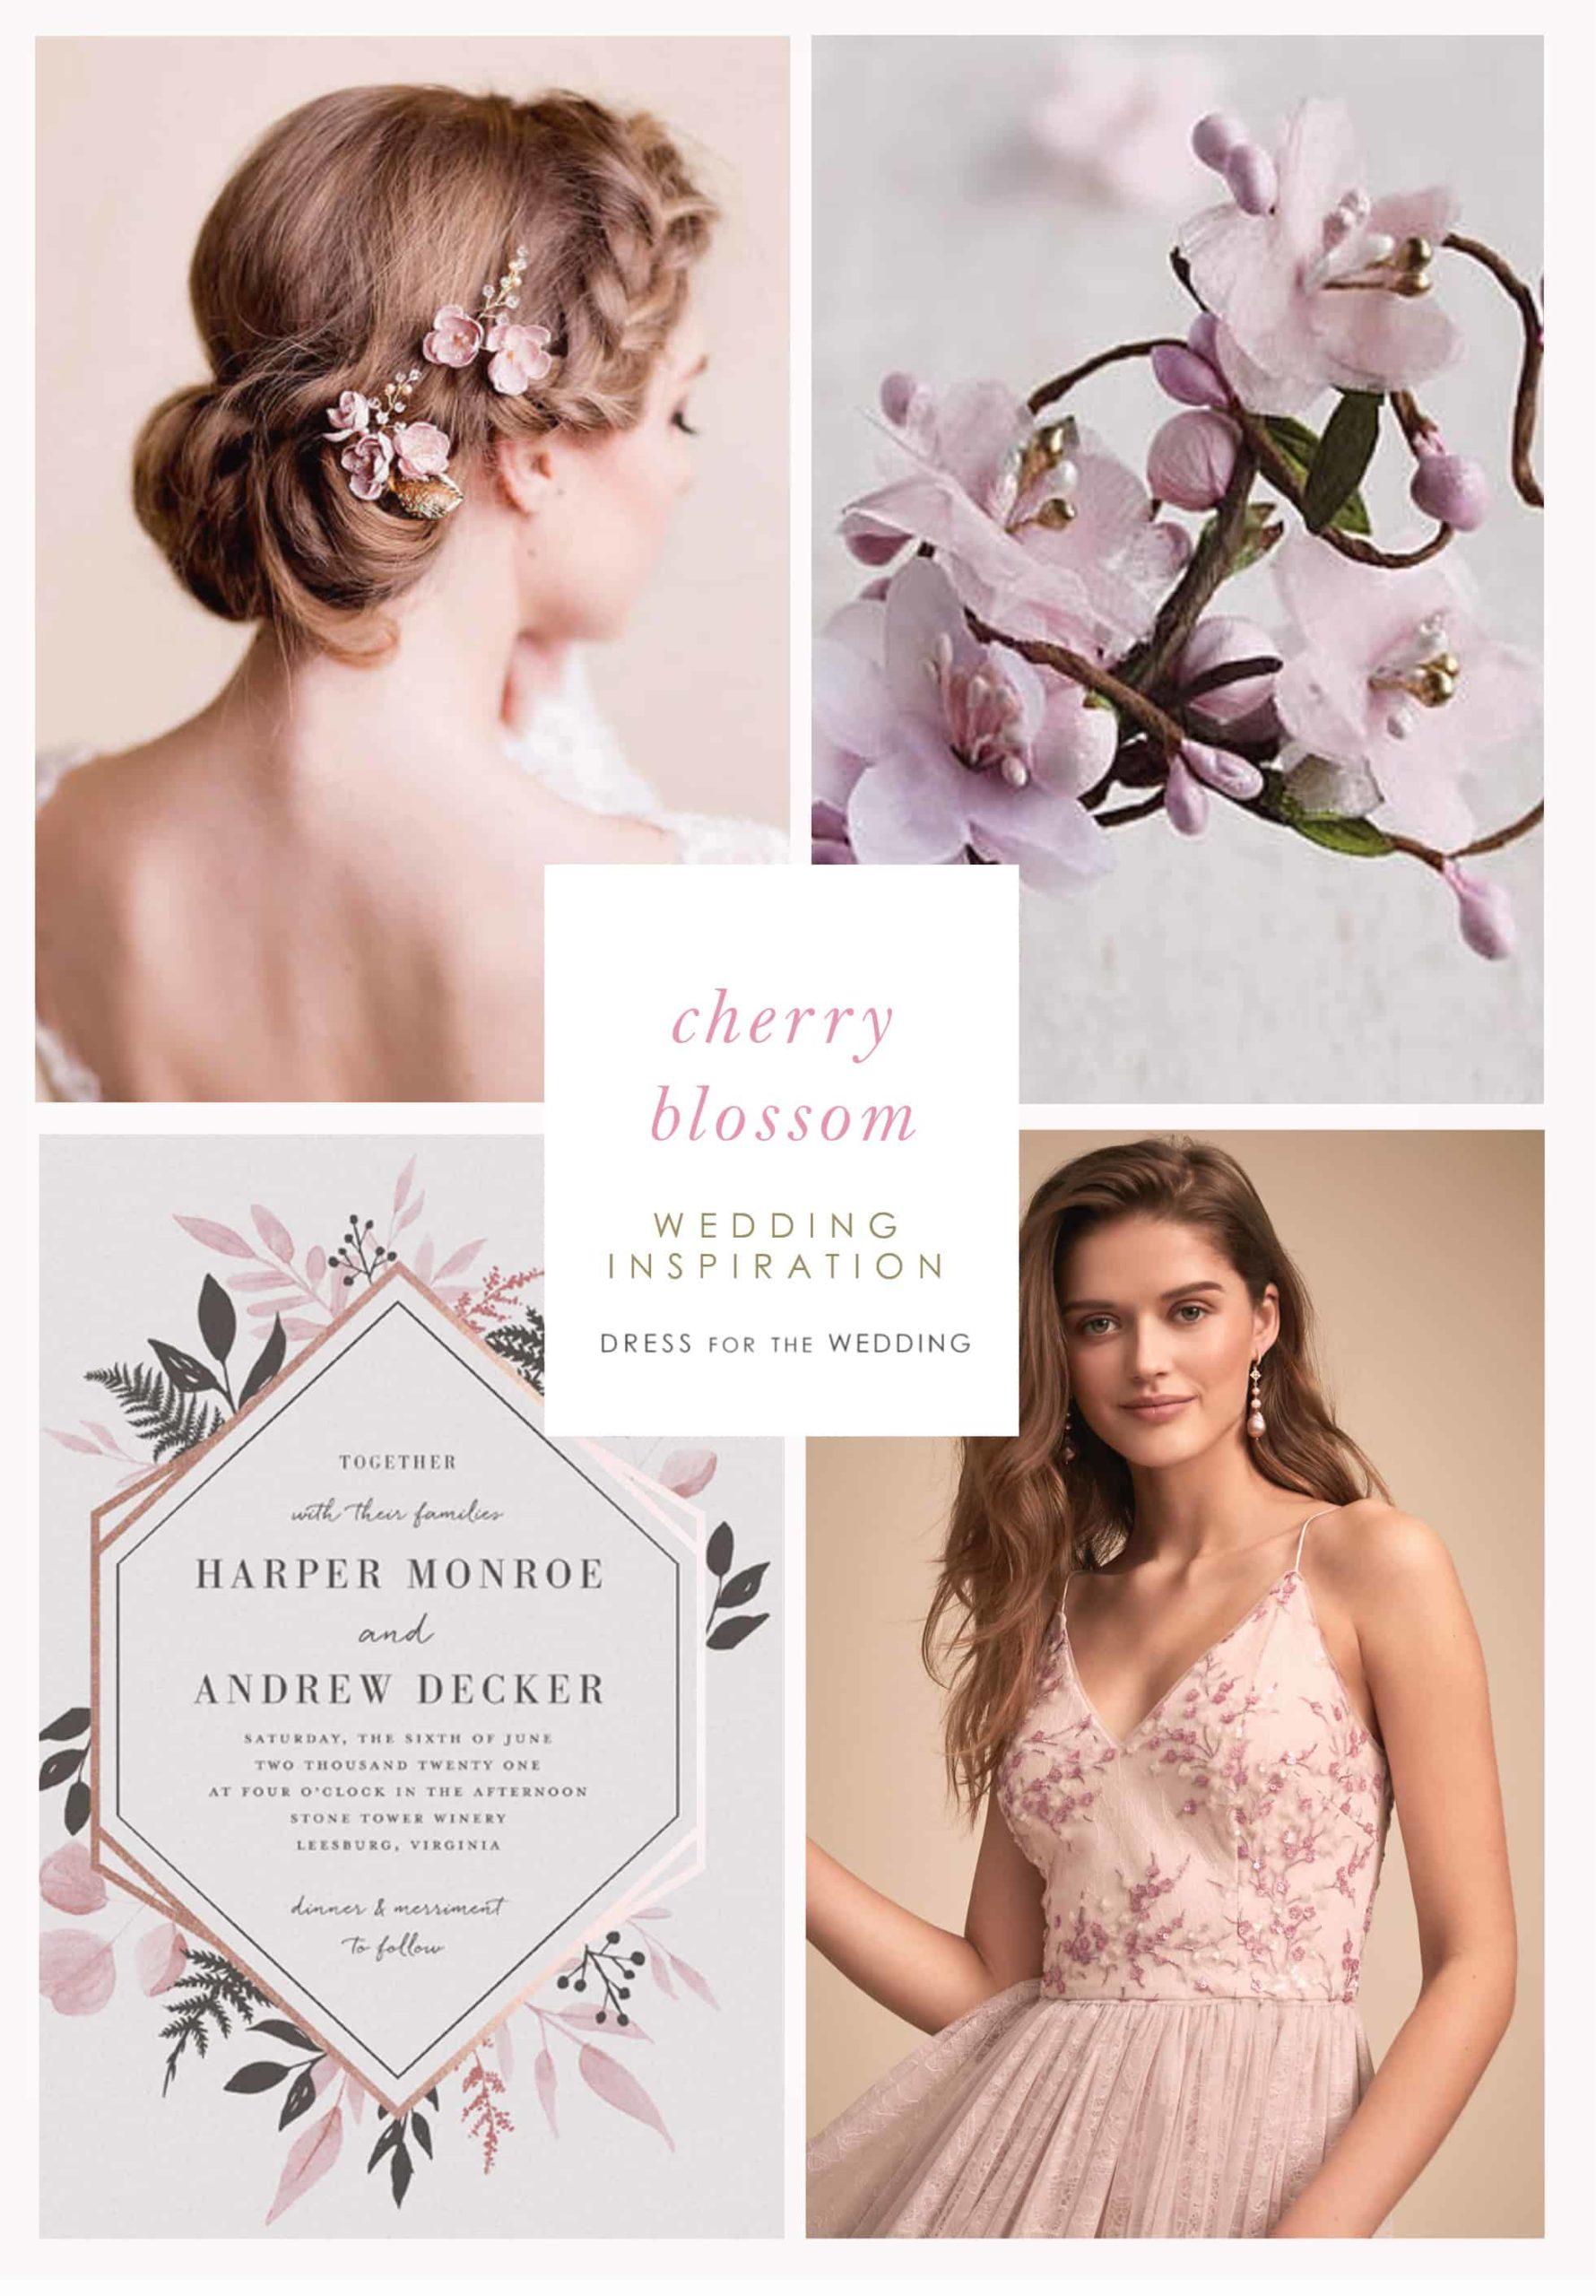 cherry blossom wedding ideas and inspiration